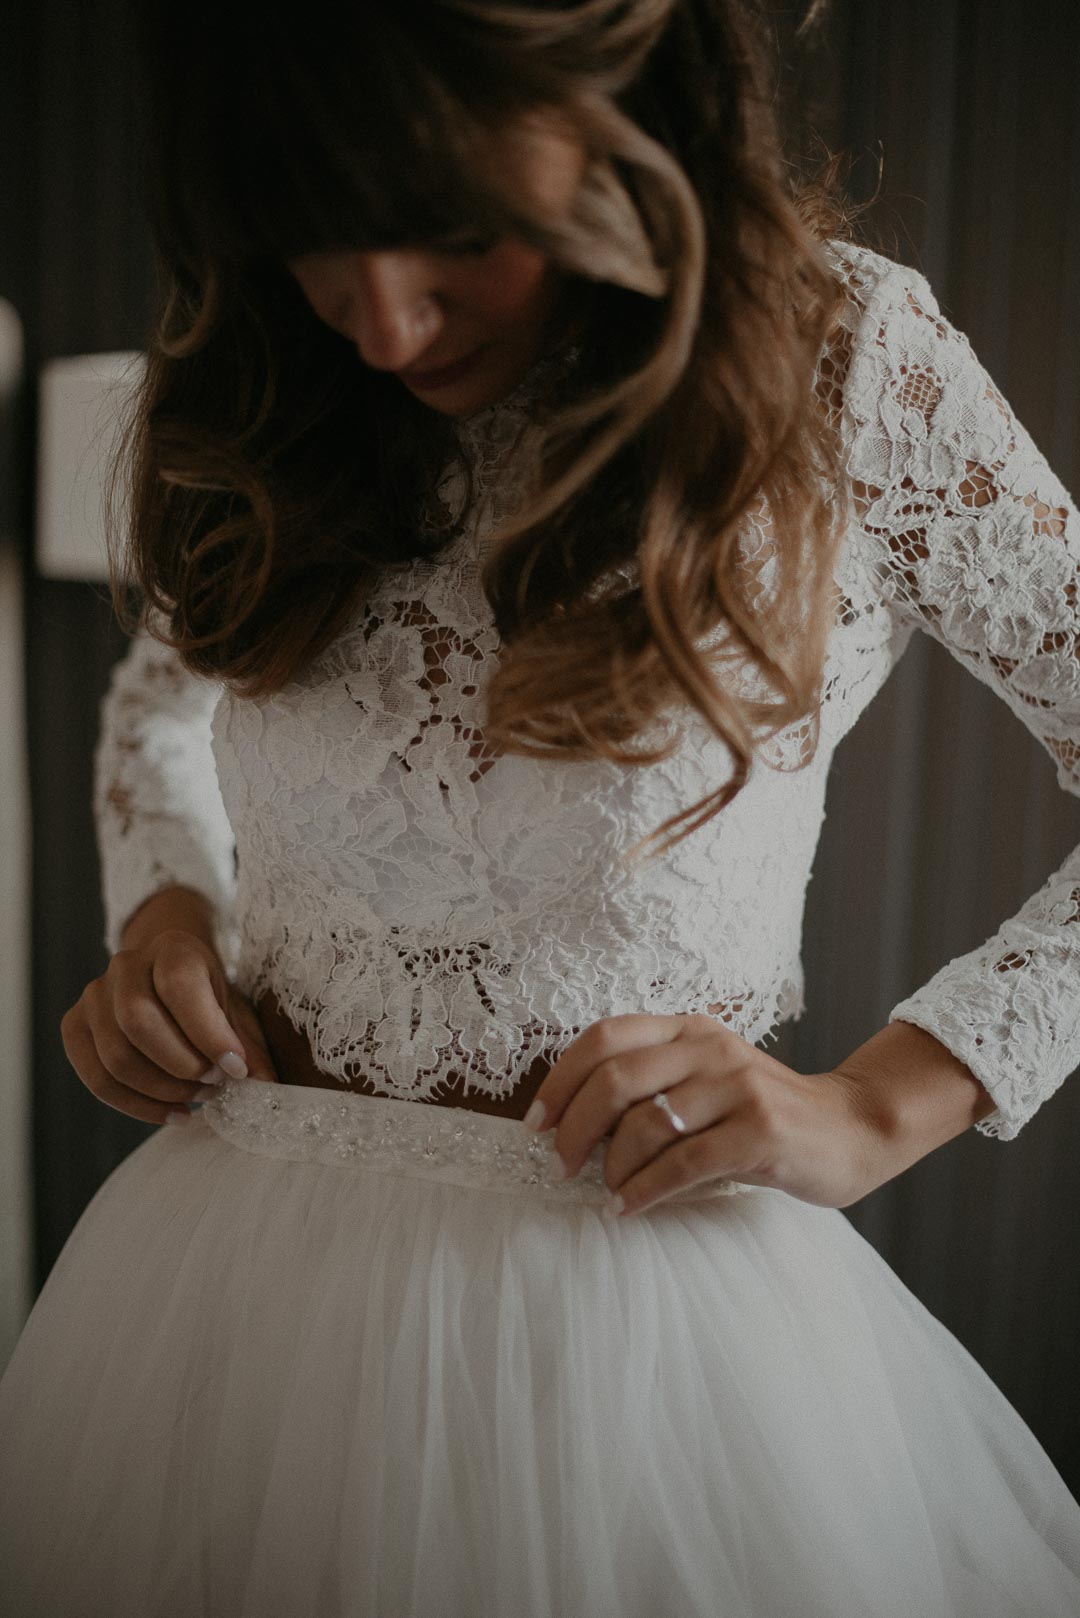 wedding-photographer-destination-fineart-bespoke-reportage-napoli-nabilah-vivianeizzo-spazio46-48